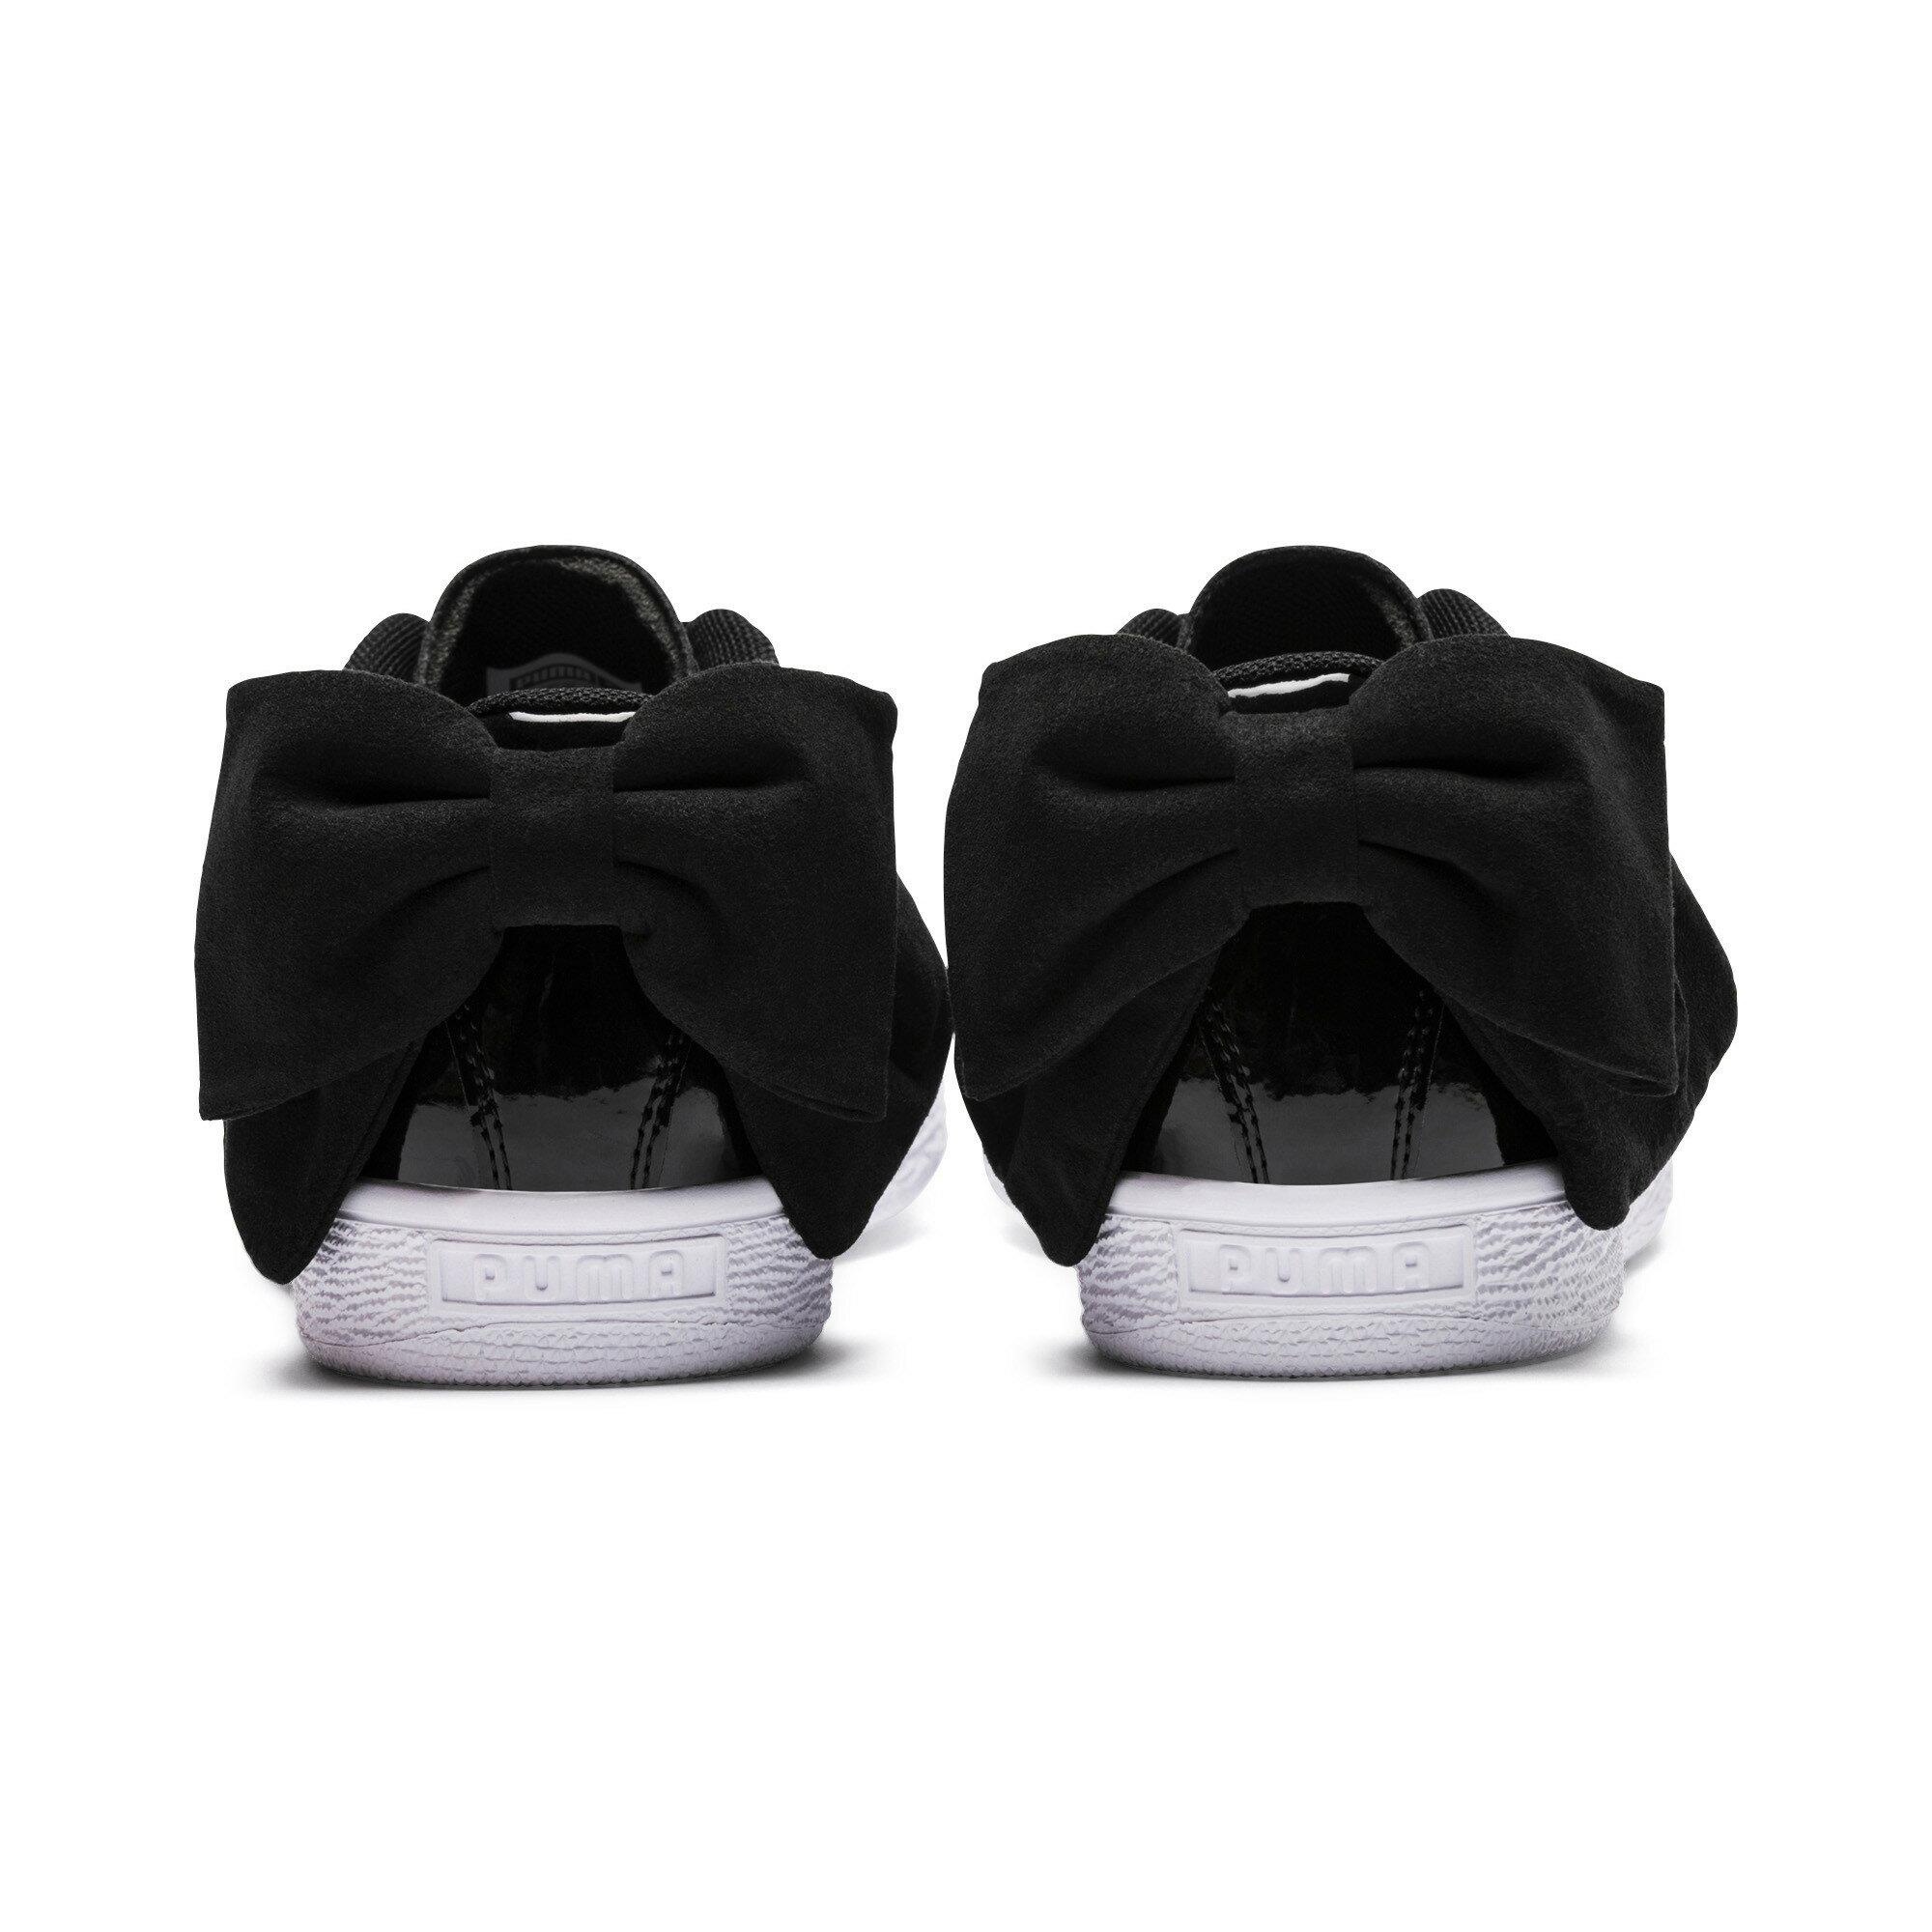 56d0e62f14598c Official Puma Store  PUMA Basket Suede Bow Women s Sneakers ...